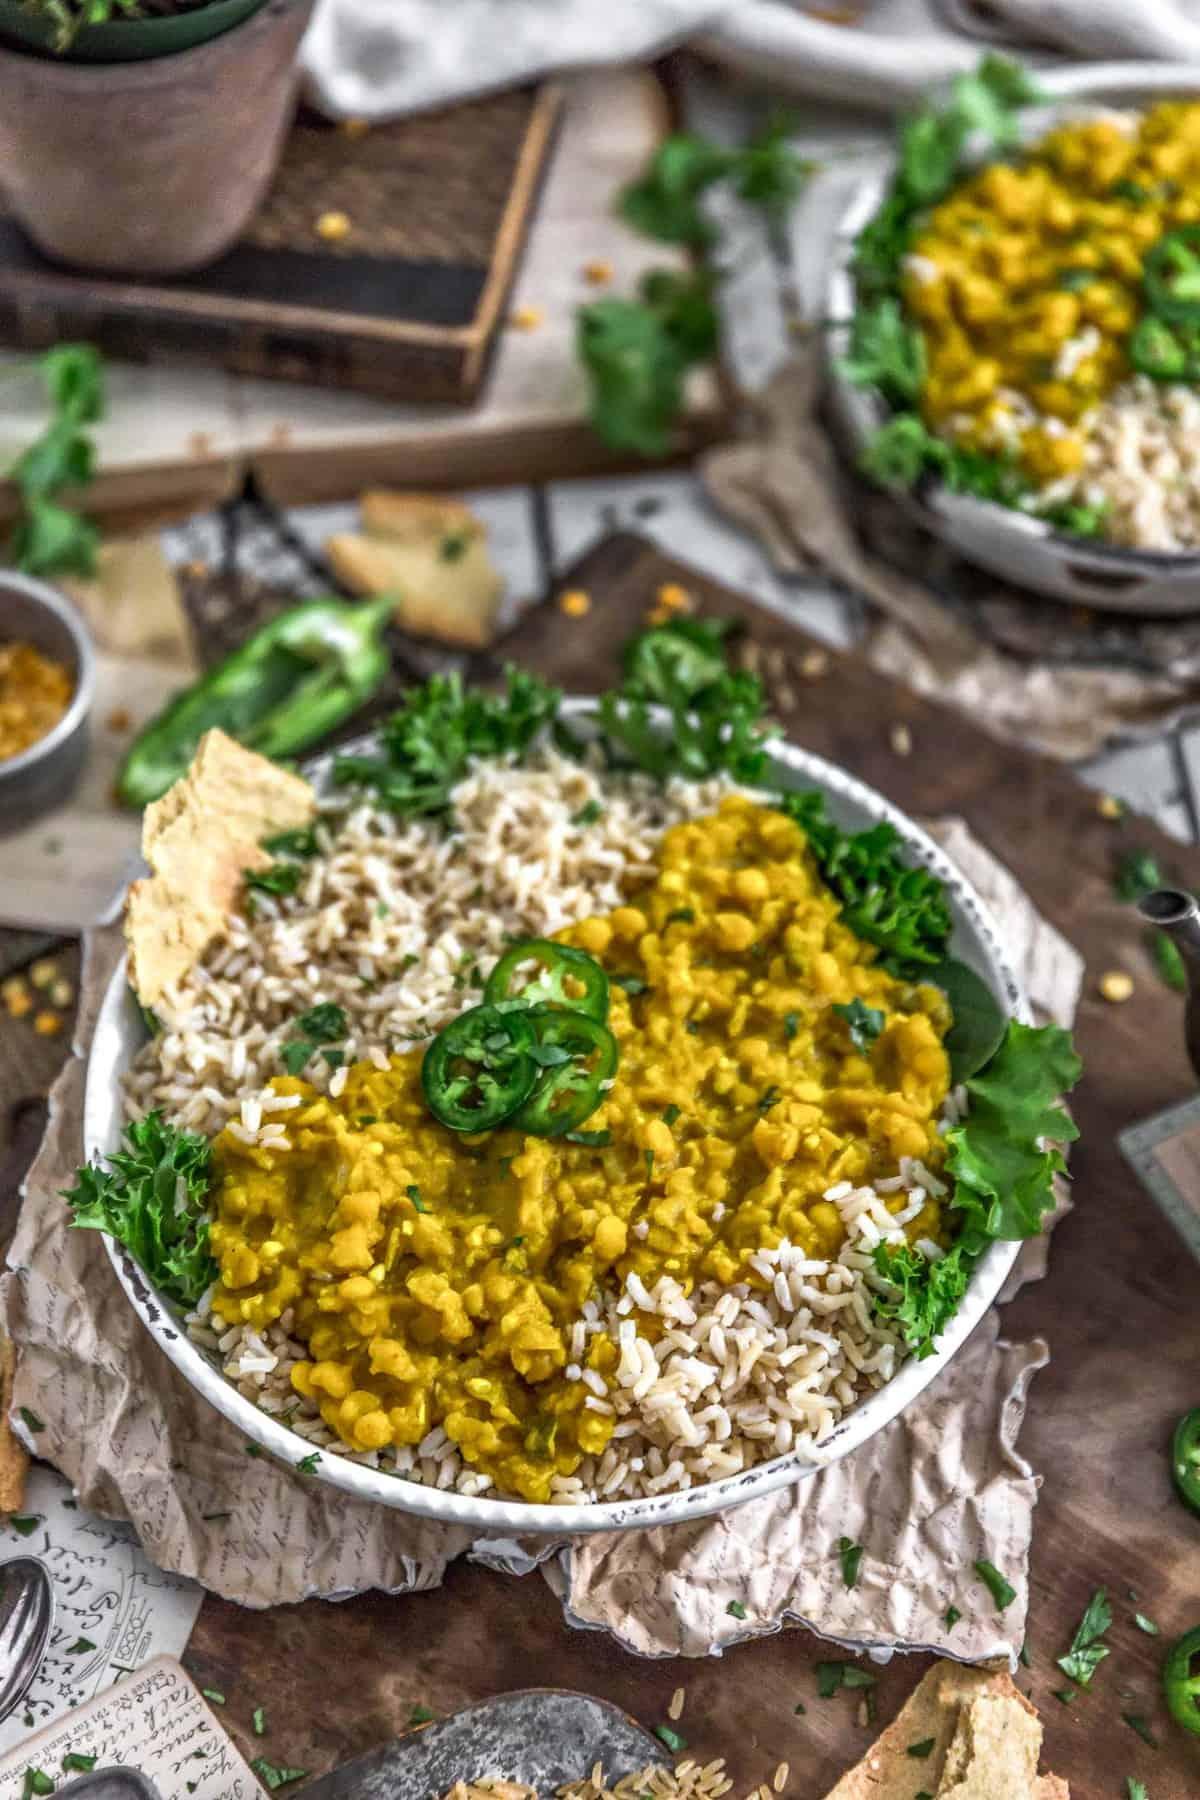 Tablescape of Ethiopian Yellow Split Pea Stew